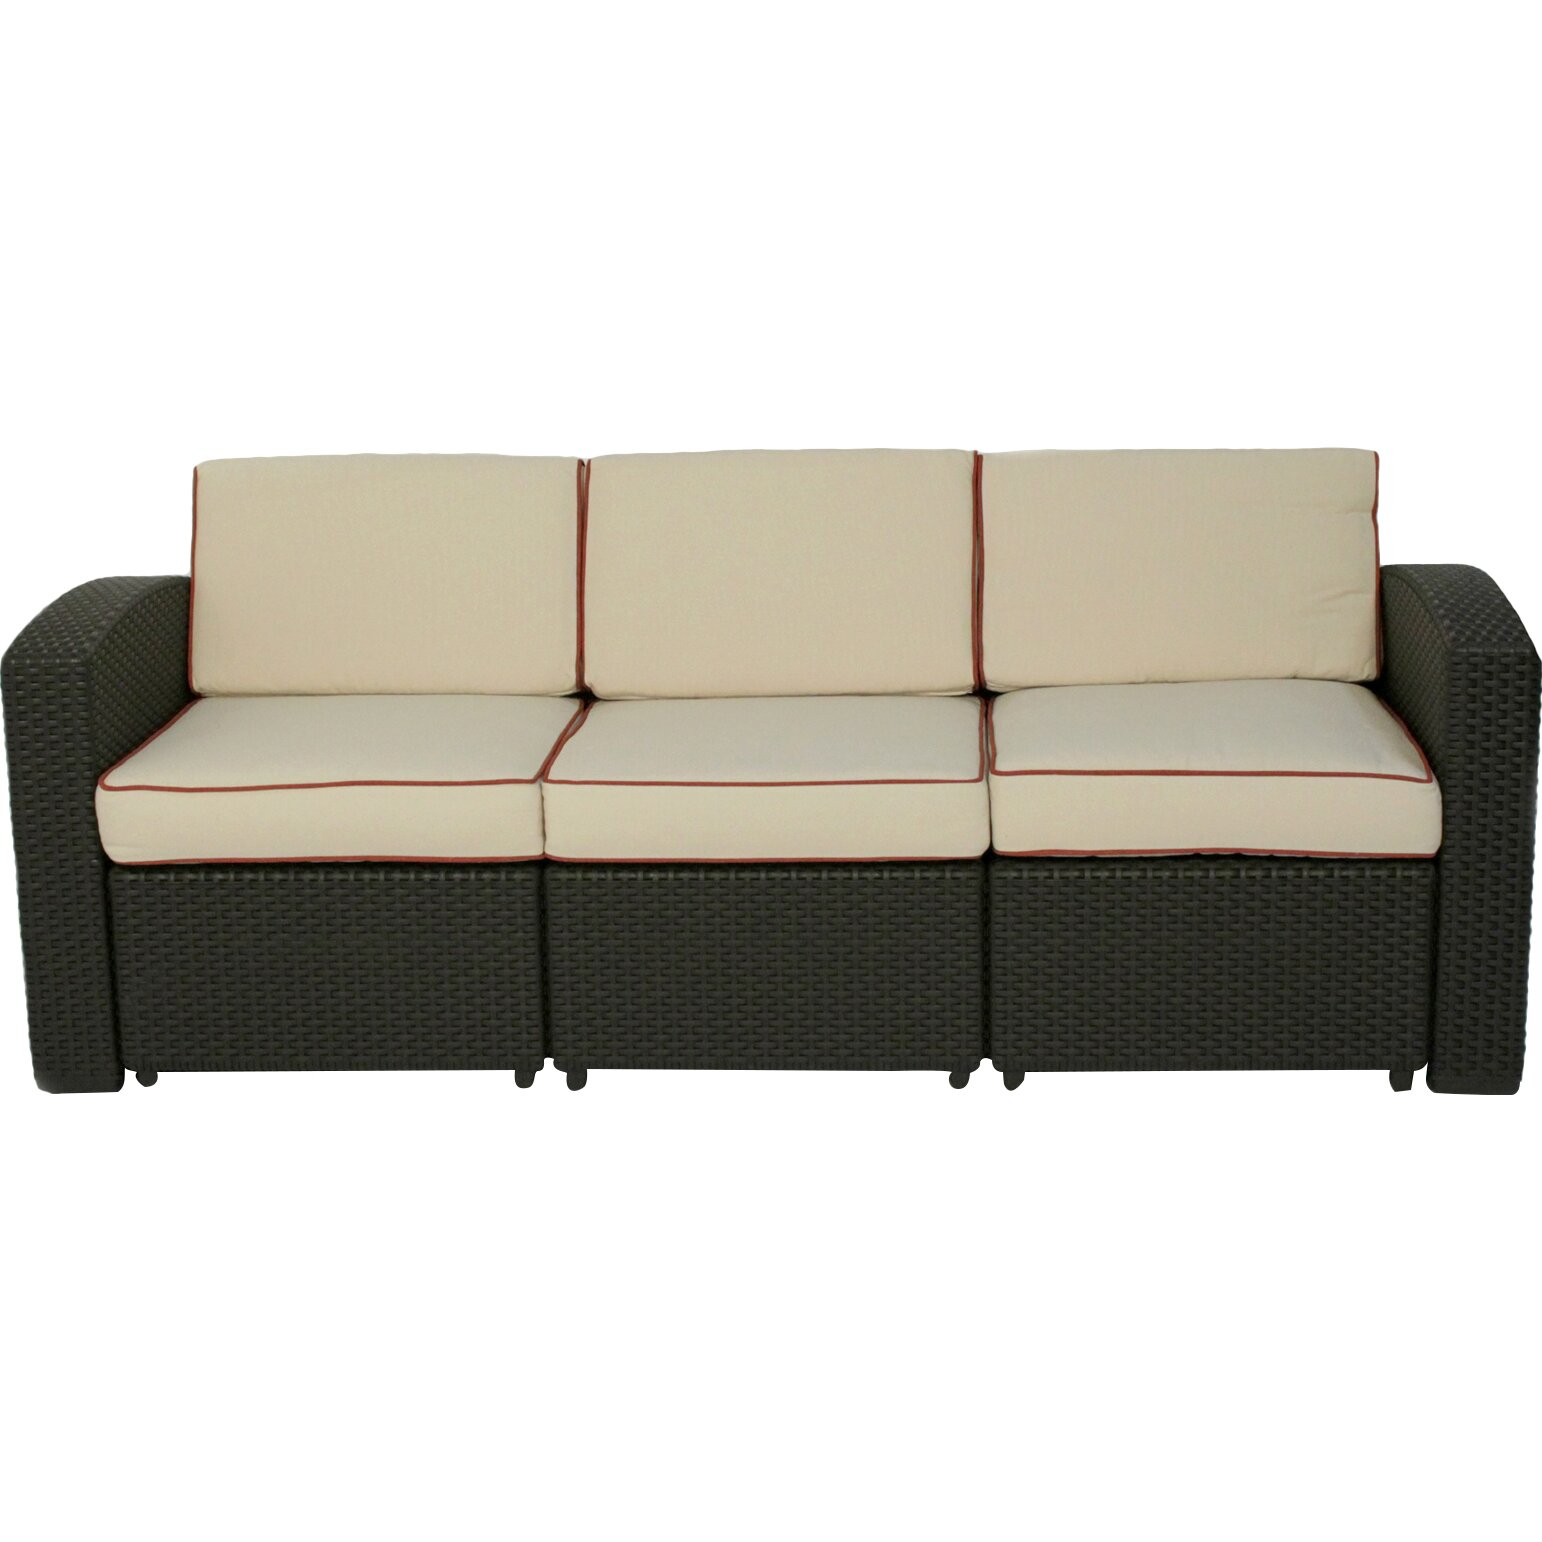 Brayden Studio Loggins Patio Sofa With Cushion Amp Reviews